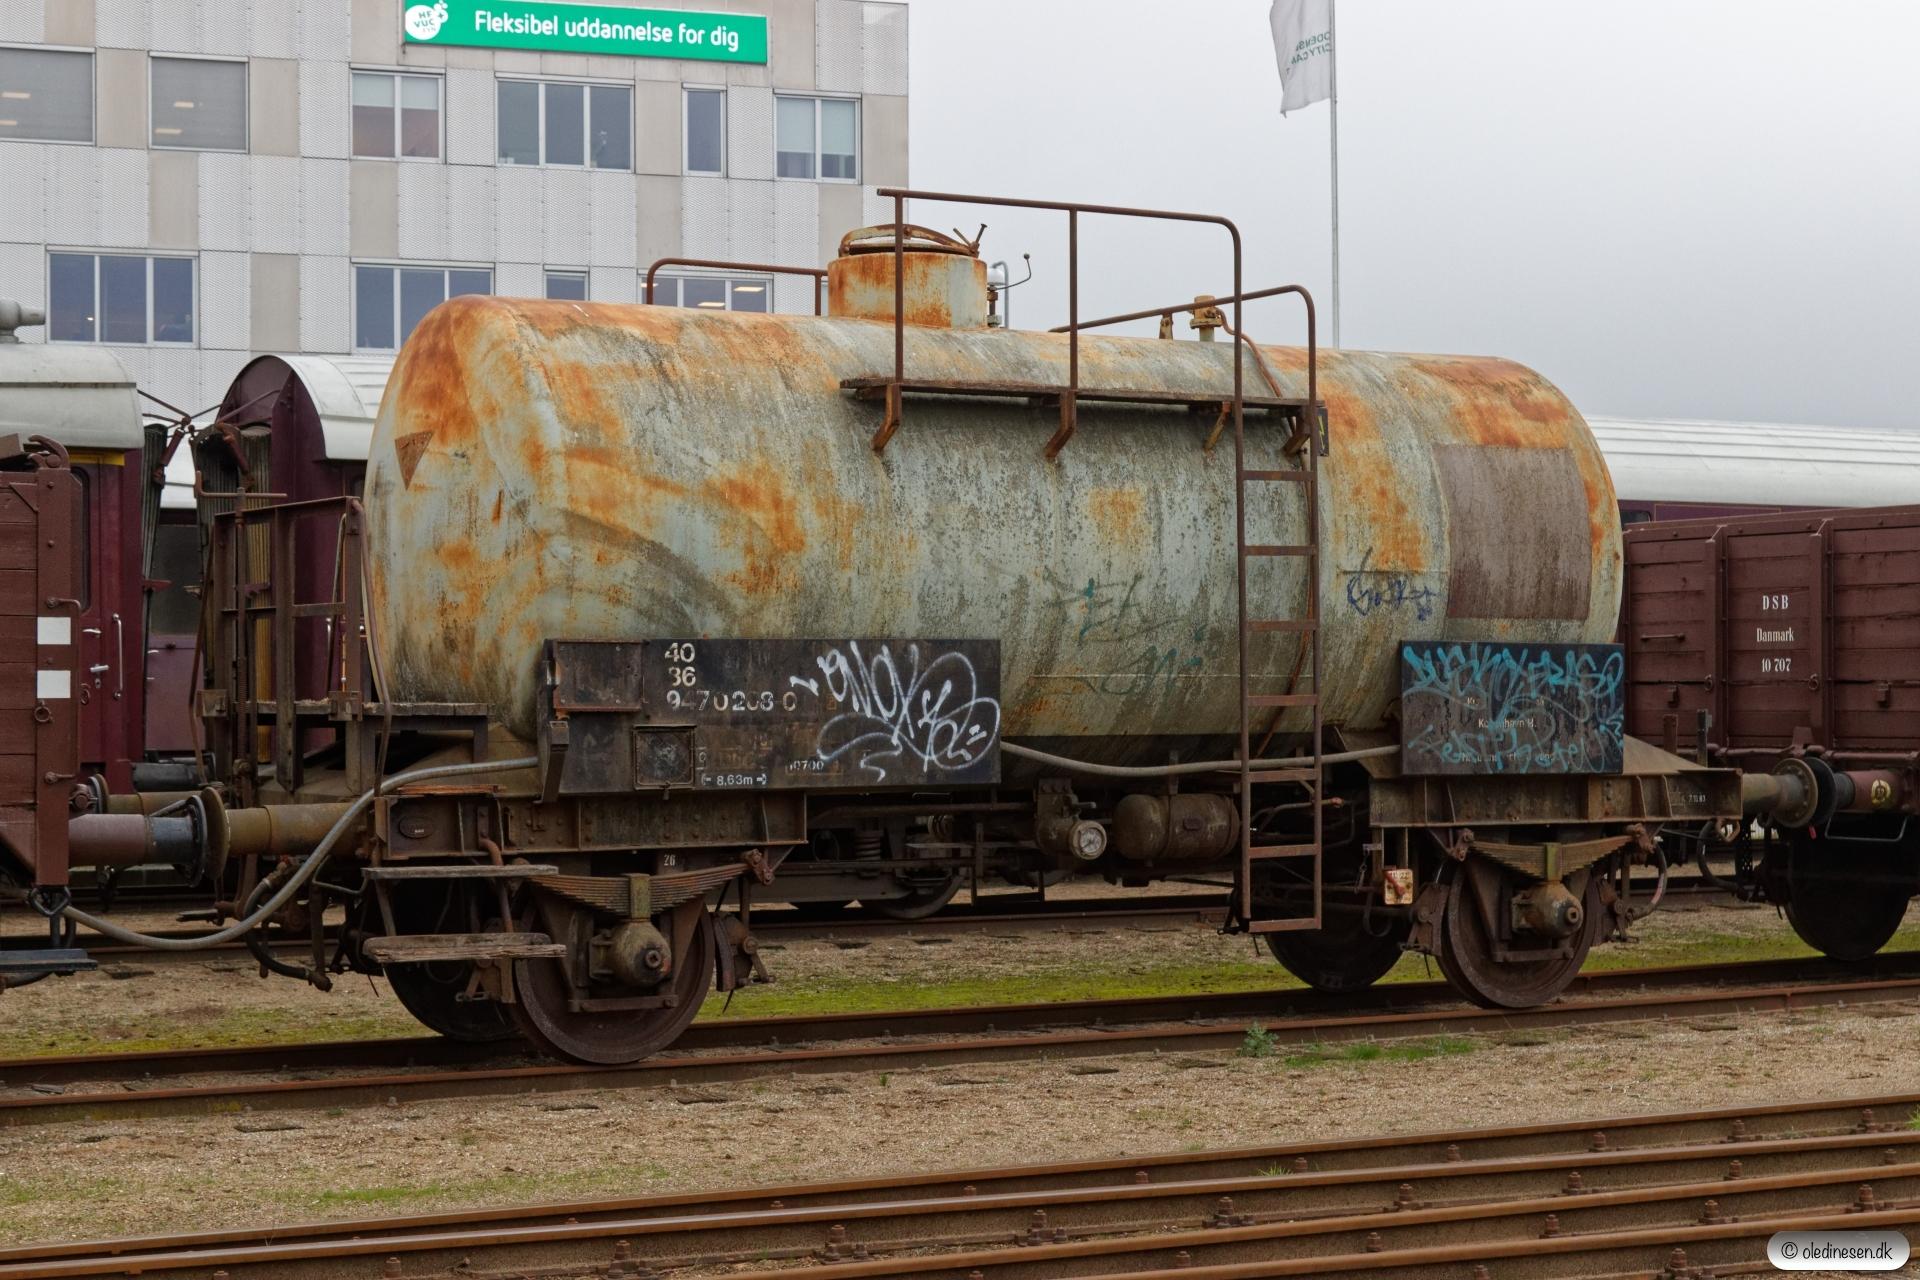 DSB 40 86 947 0 208-0 (ex. ZE 502853). Odense 25.11.2019.